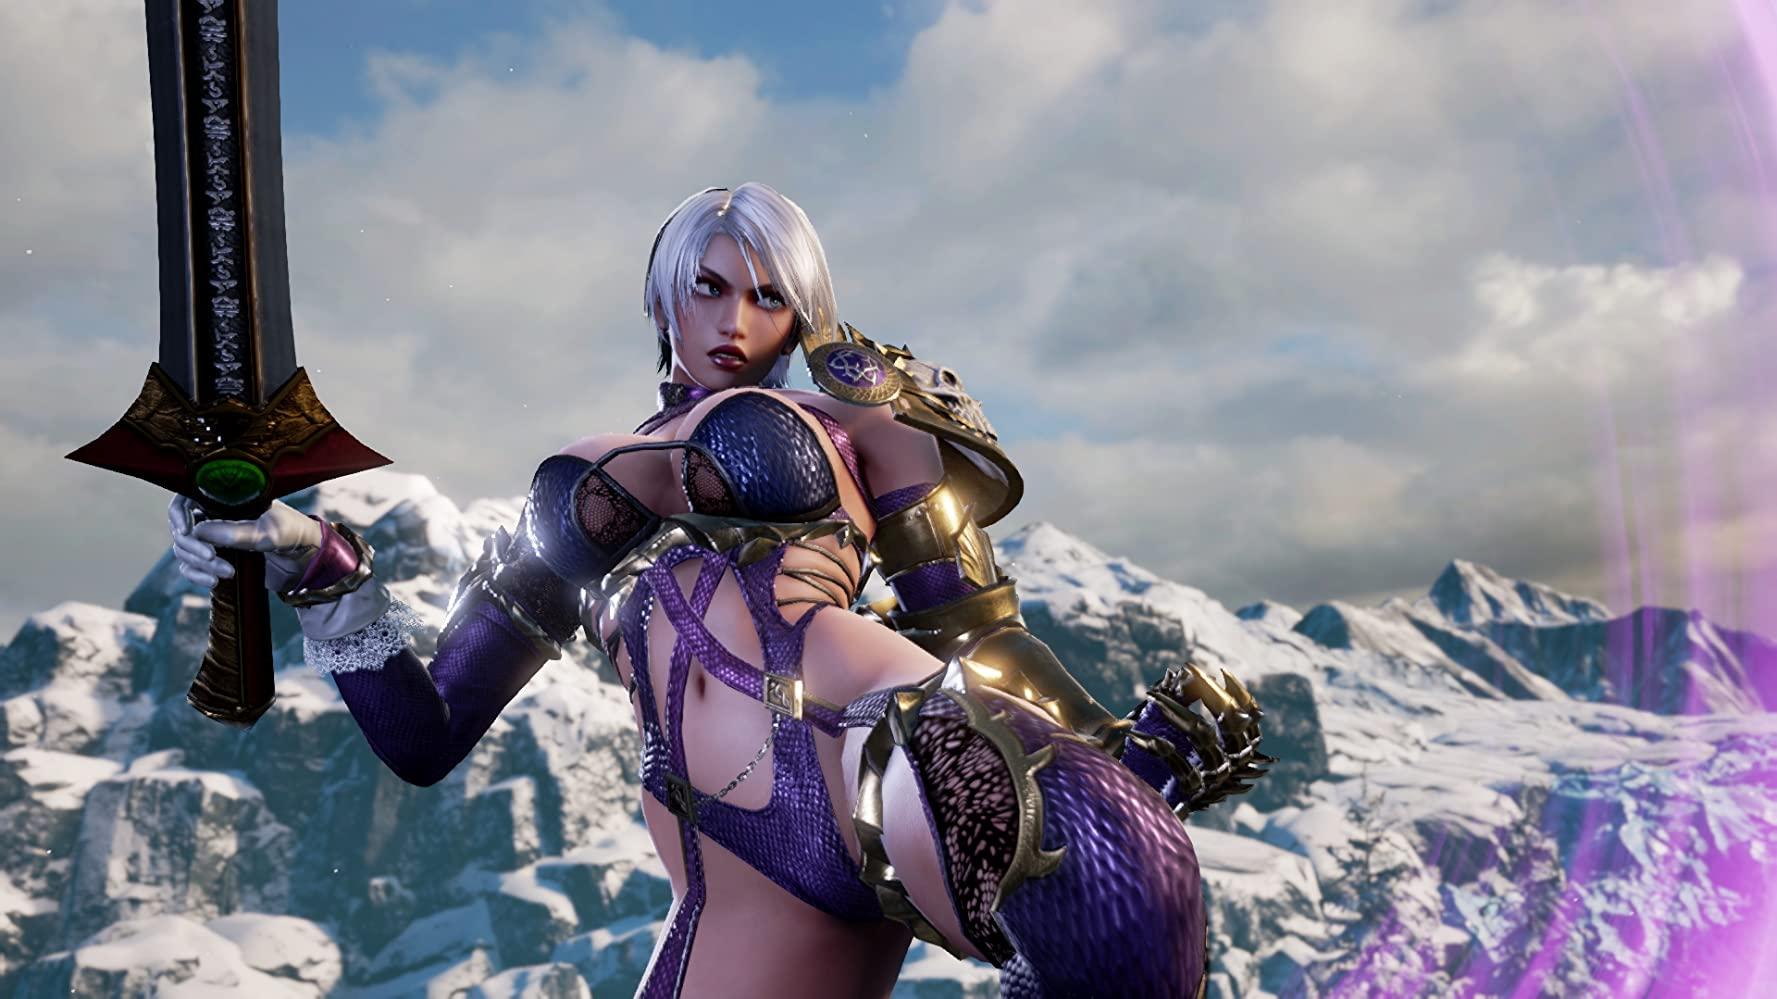 Gender Struggles: Female Representation in Video Games